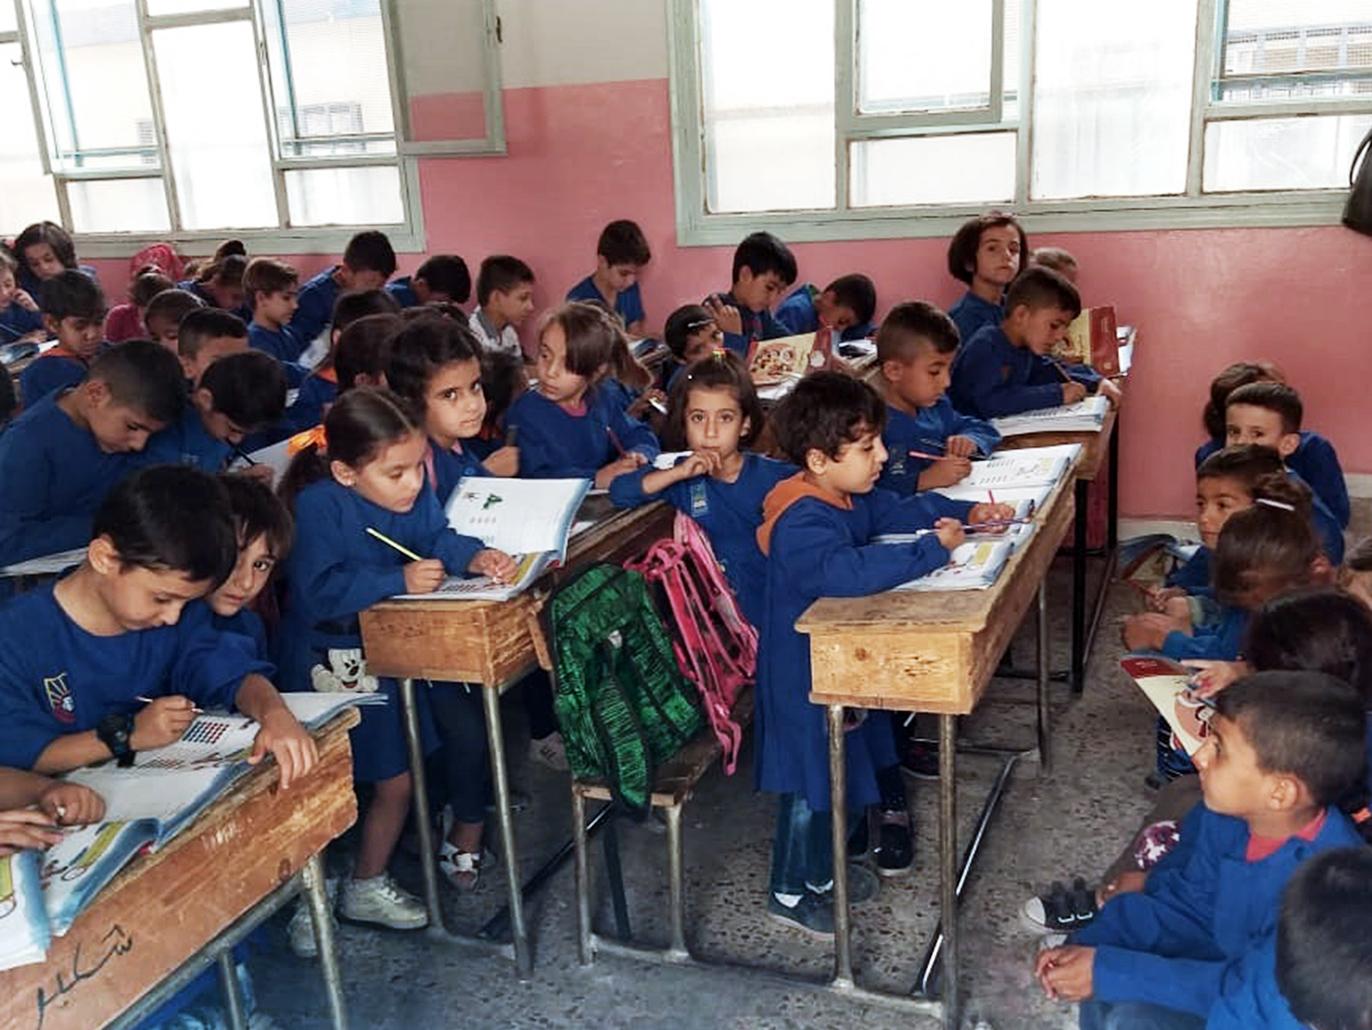 The regime closes 7 classes in Lattakia schools due to Corona